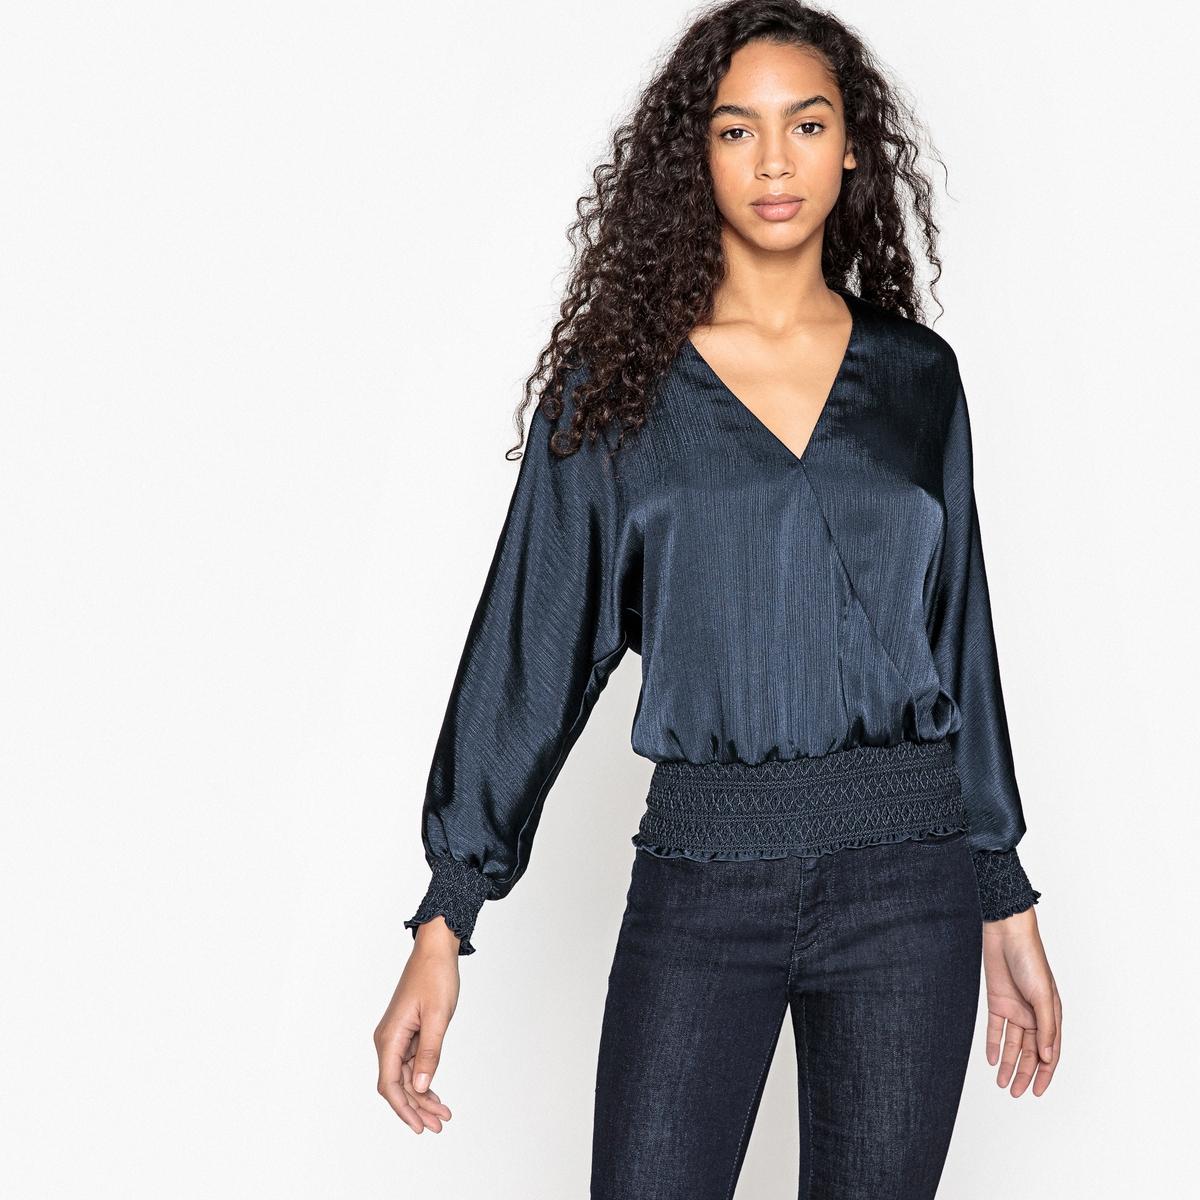 Блузка в форме каш-кер, края рукавов со складками